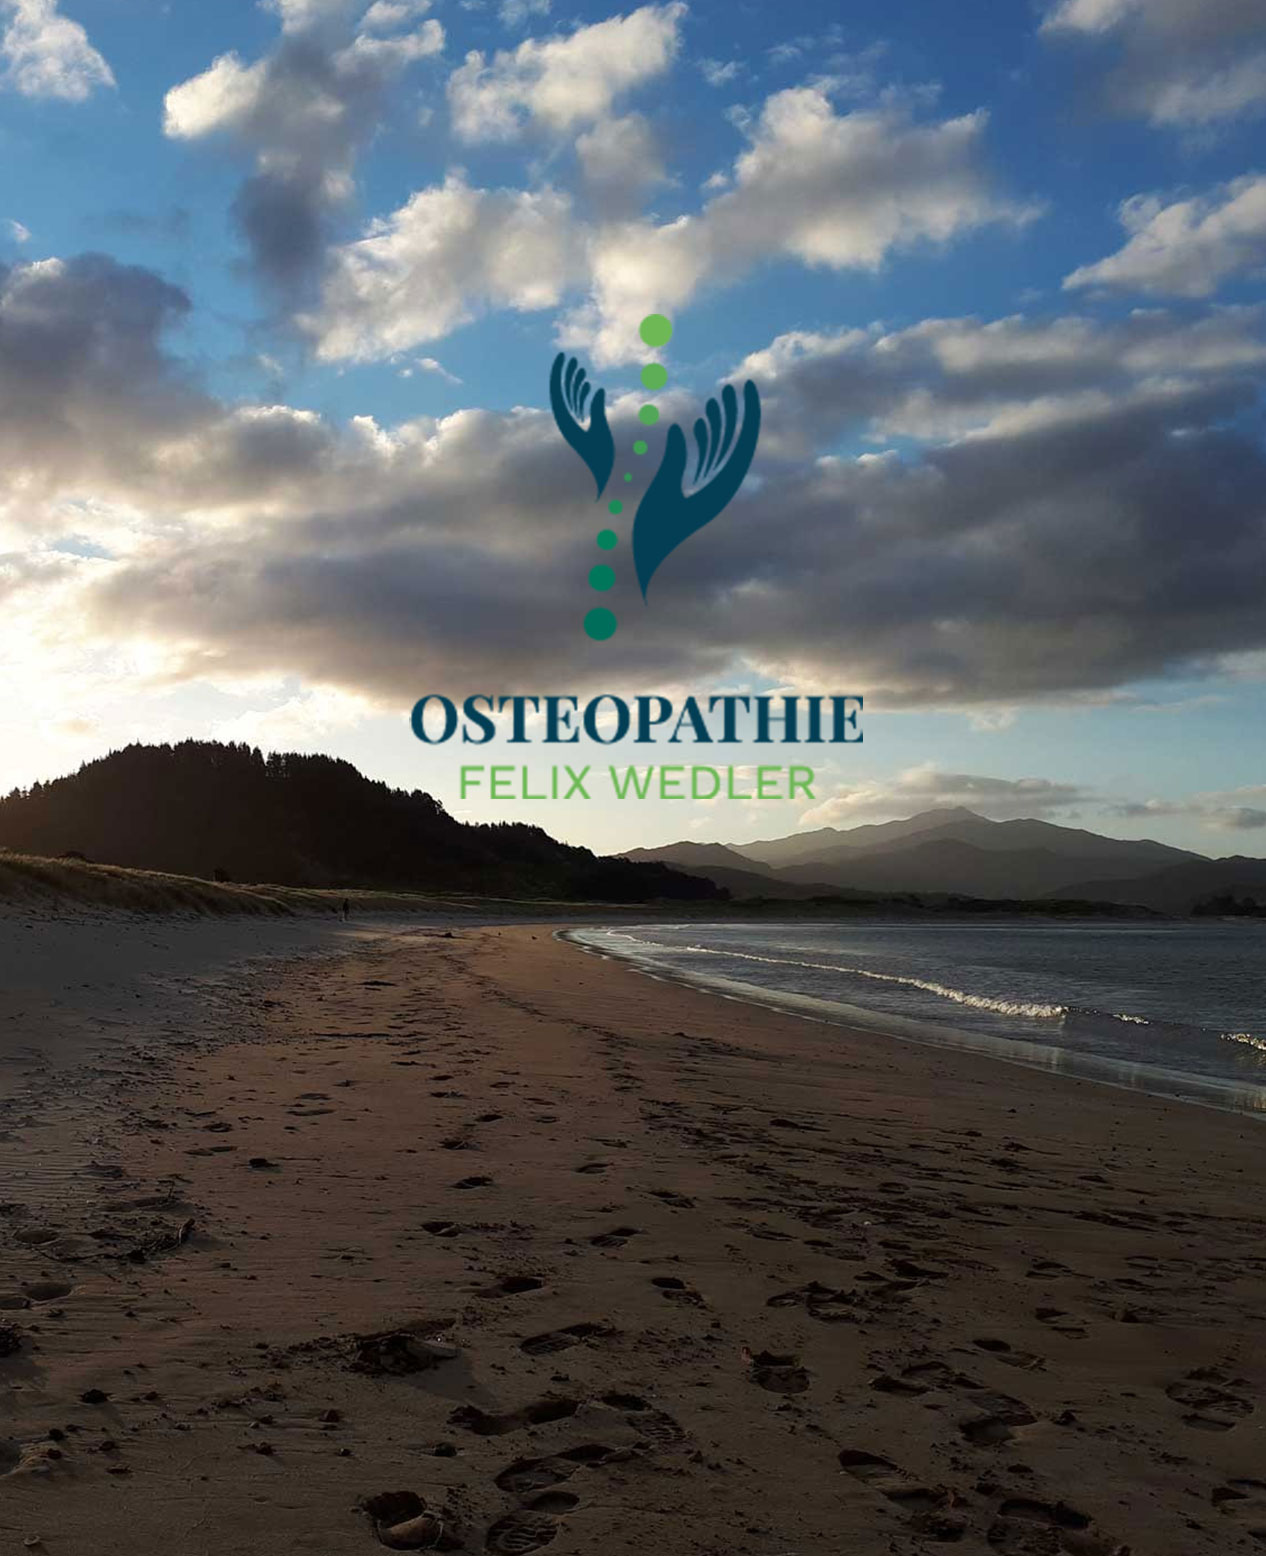 Osteopathie Felix Wedler Referenz